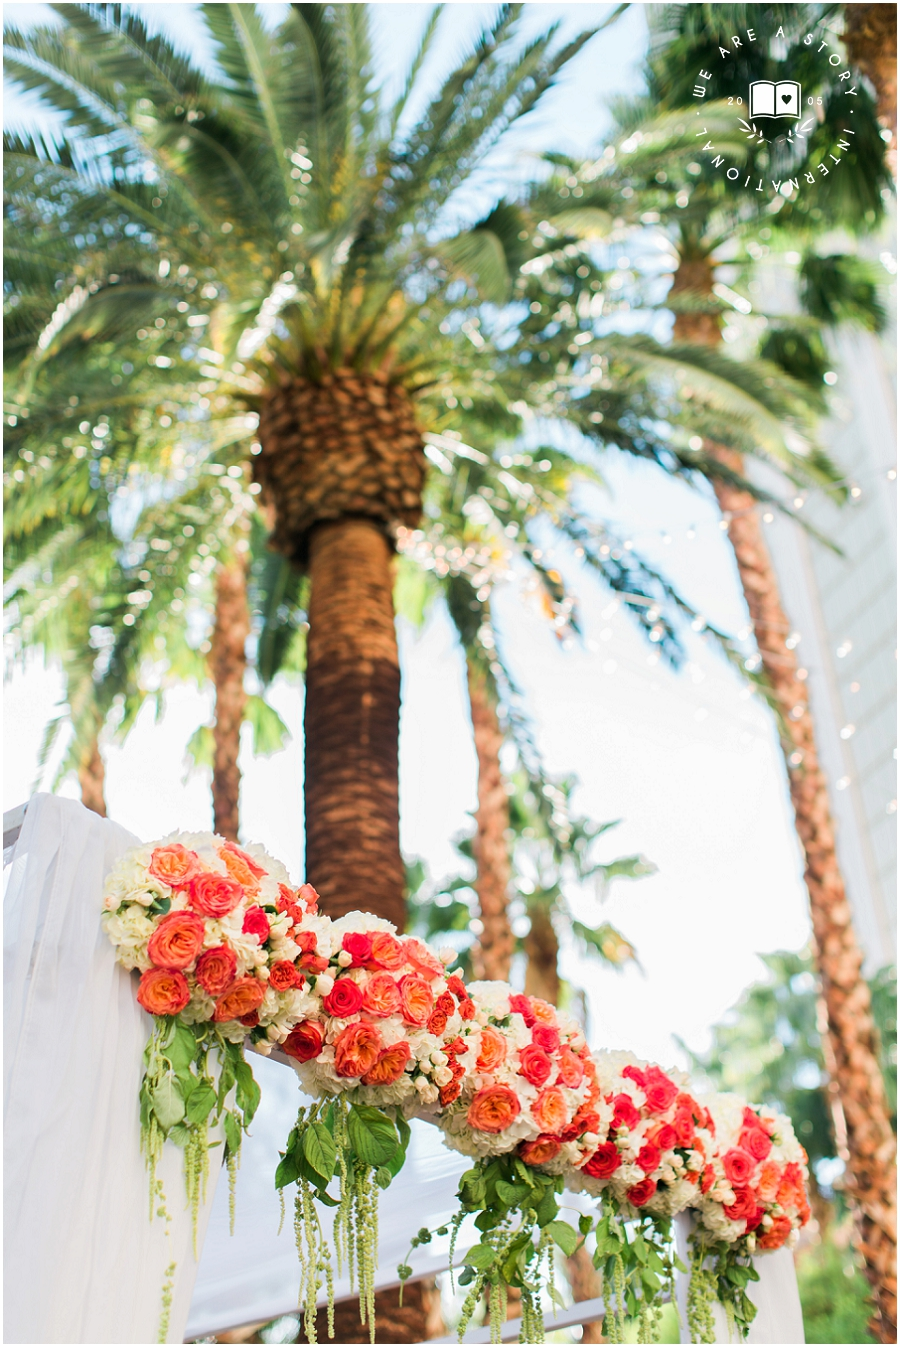 Four Seasons wedding photographer Las Vegas _ We Are A Story wedding photographer_2480.jpg